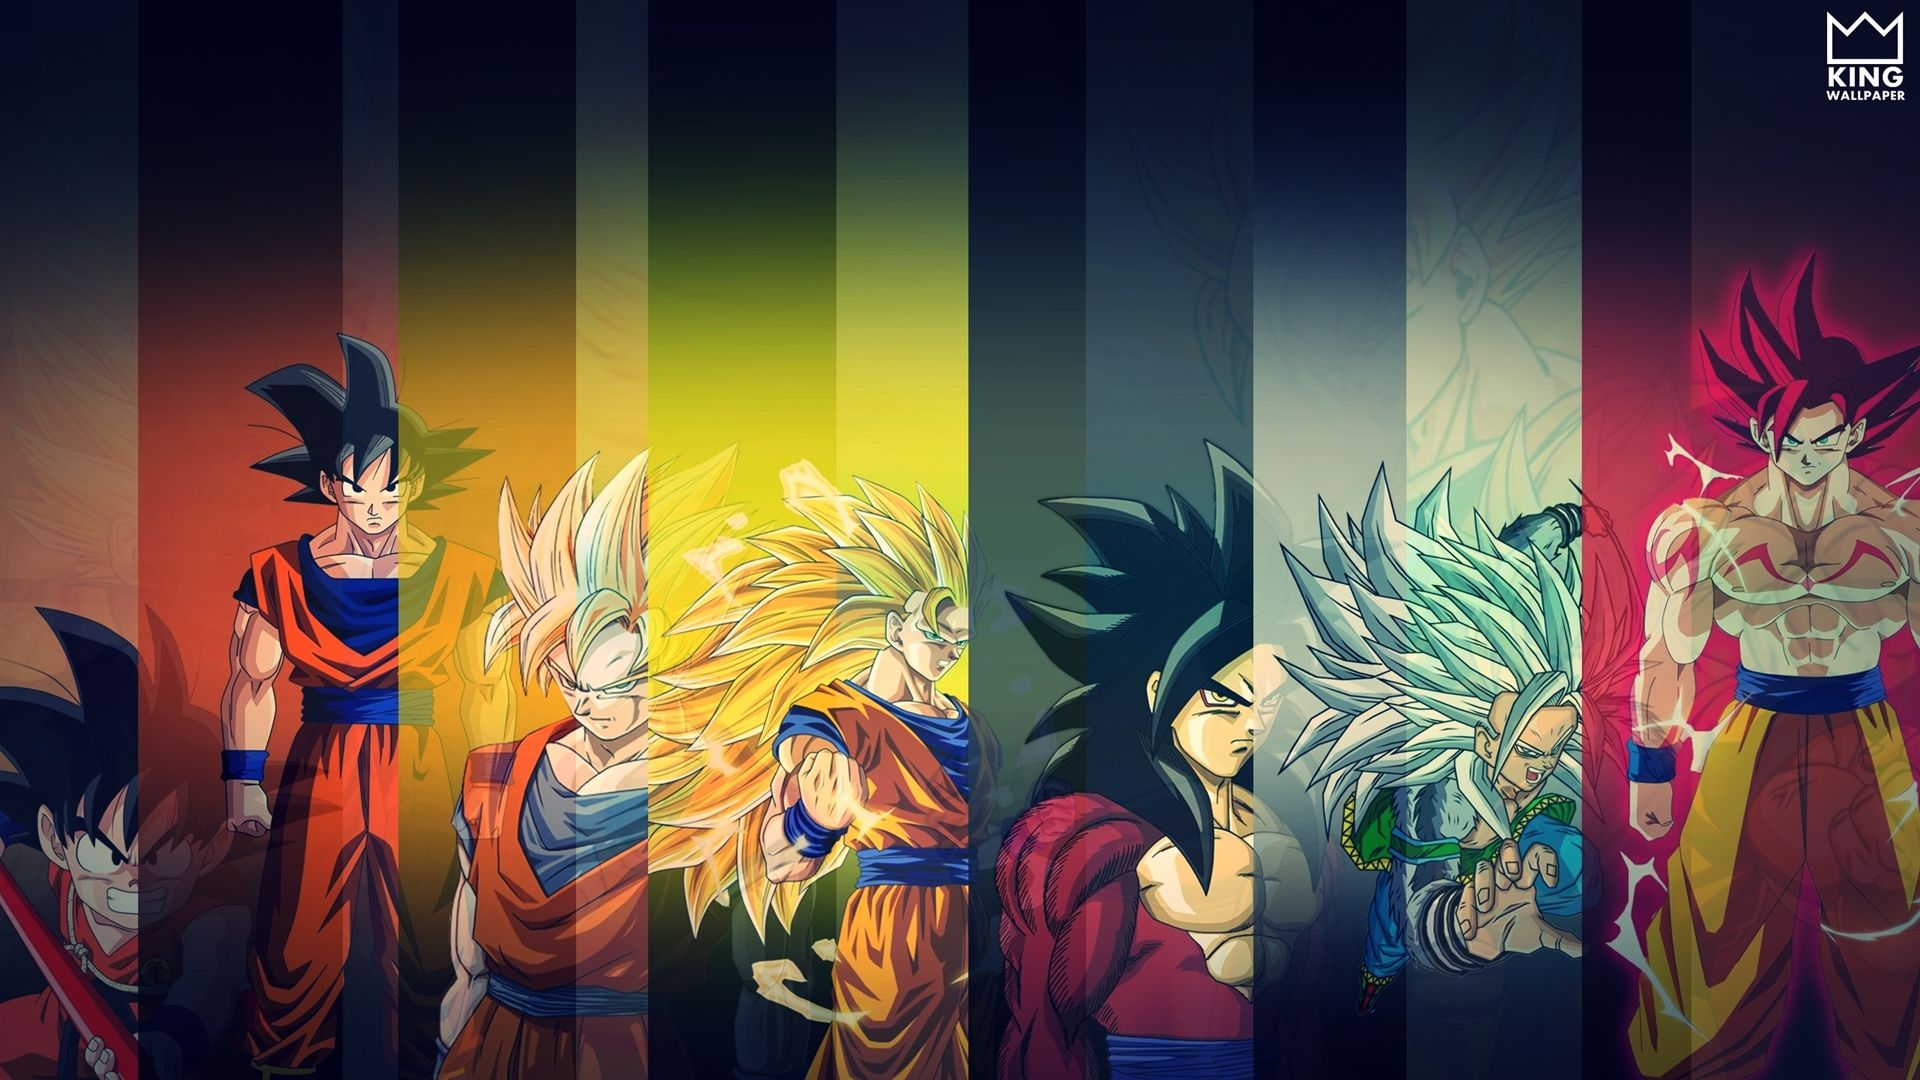 Epic Dbz Wallpapers High Resolution: 40 Best Goku Wallpaper Hd For PC: Dragon Ball Z